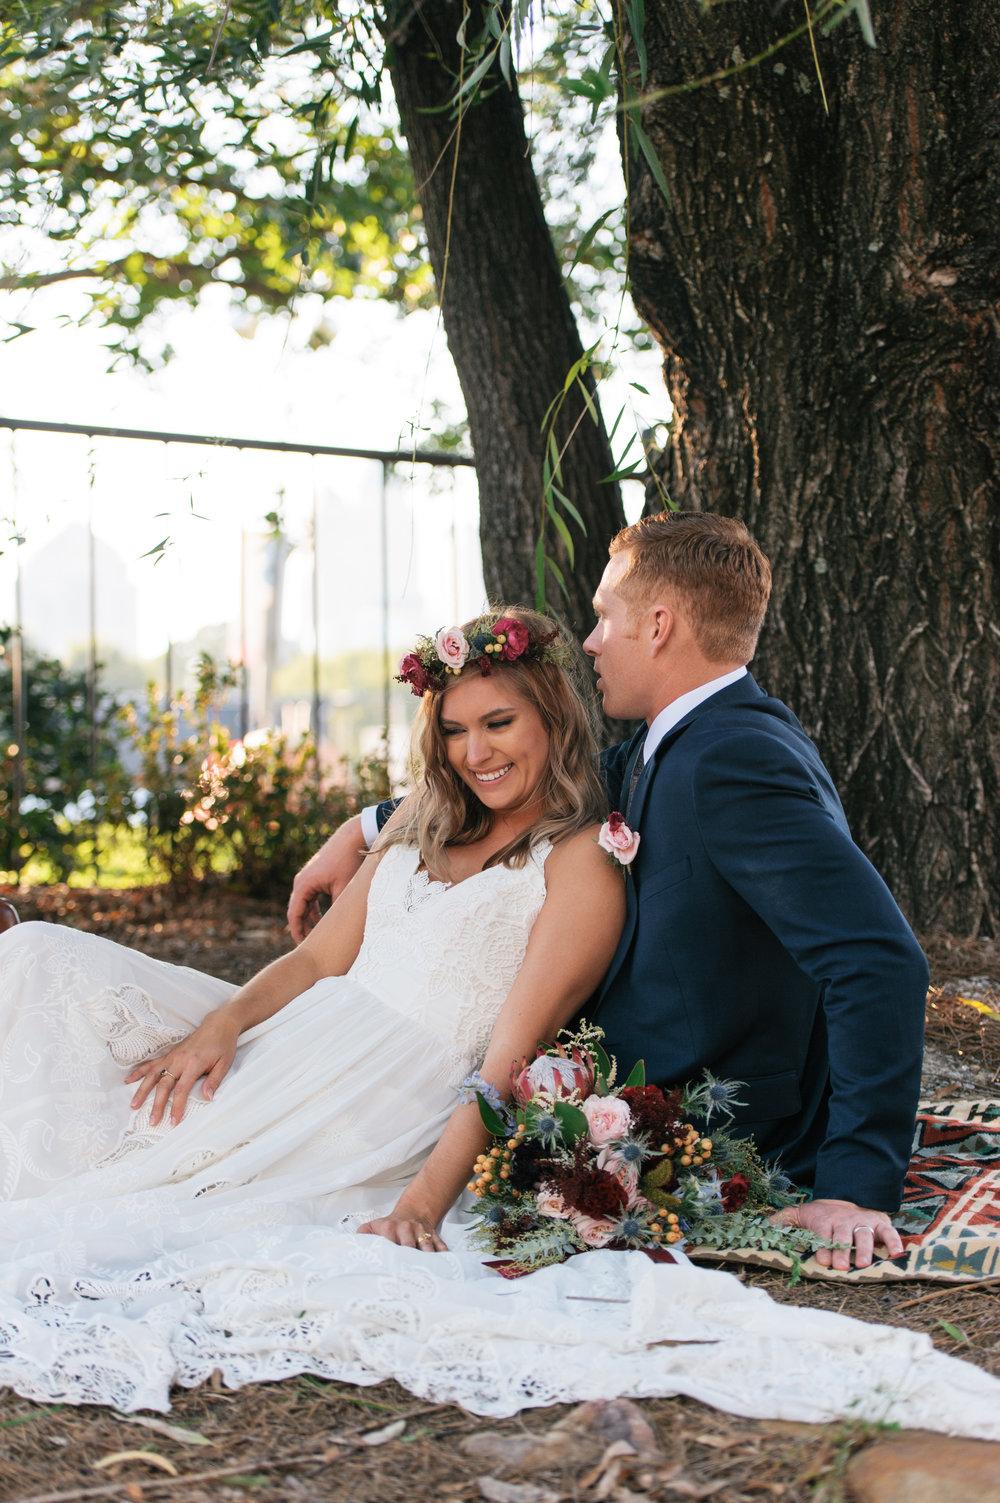 kristin-and-peter-atlanta-georgia-wedding-october-8th-2016 (532 of 1068).jpg